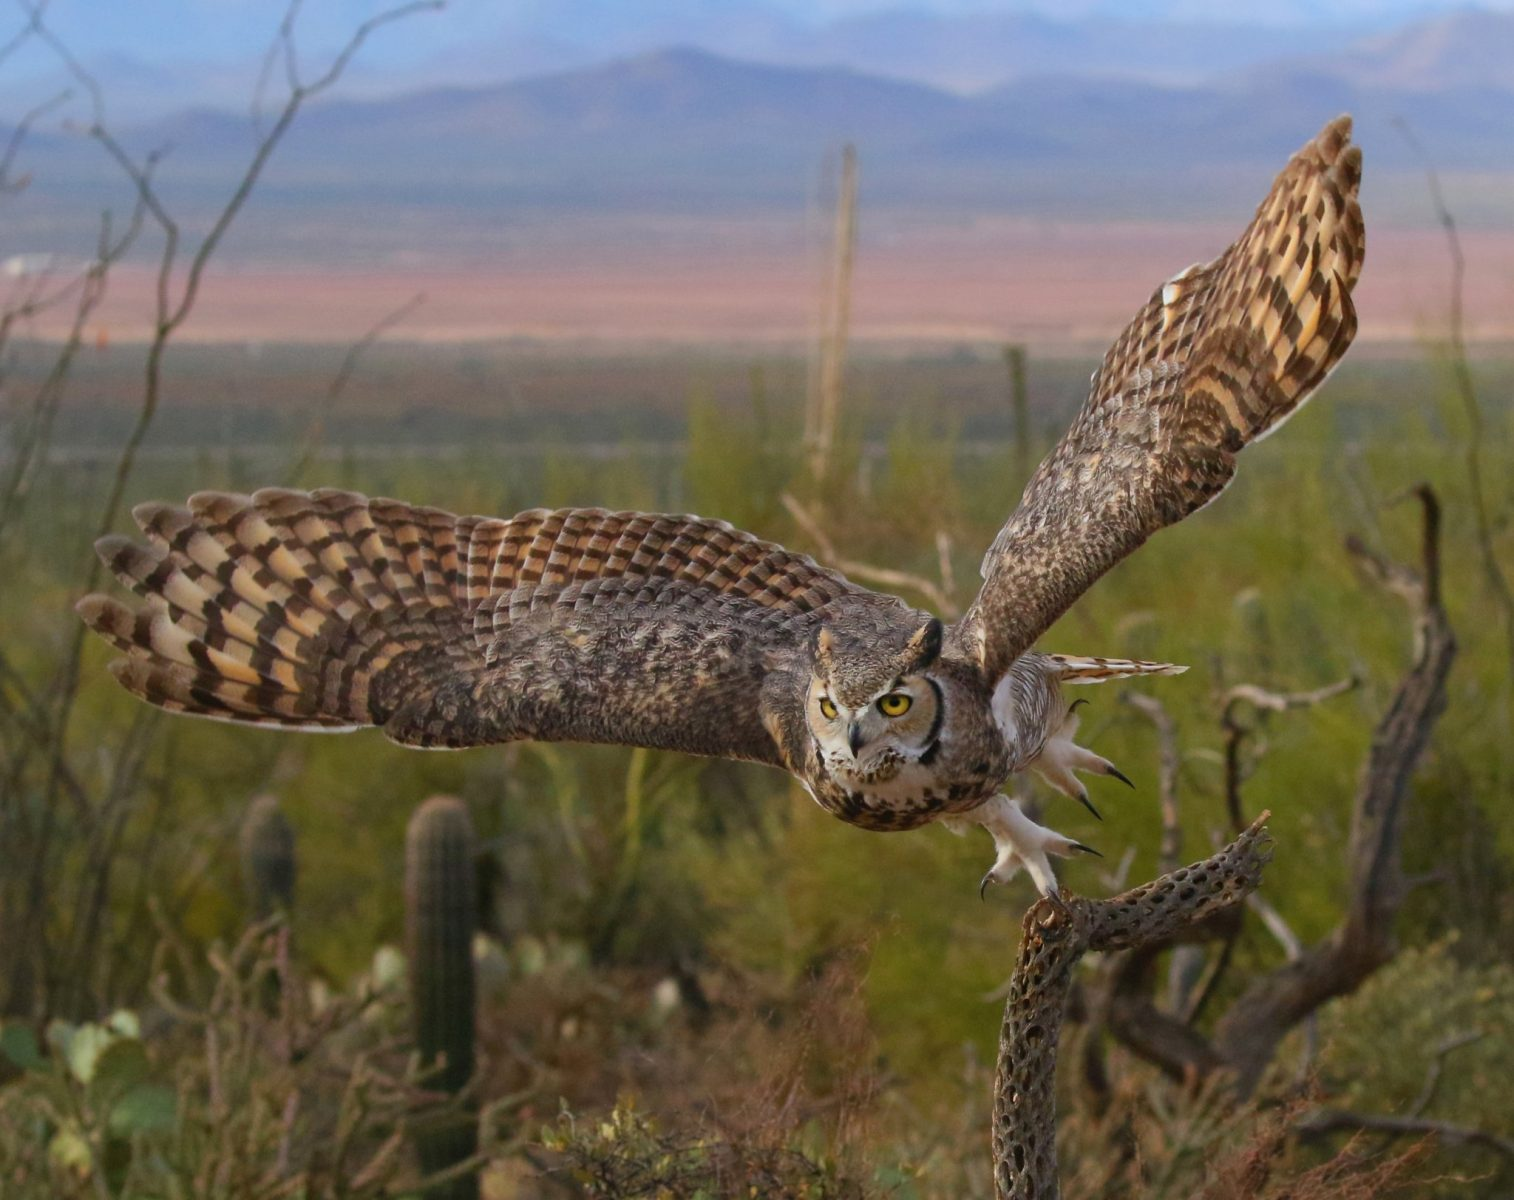 1st - Steven Cirone - Owl Takeoff